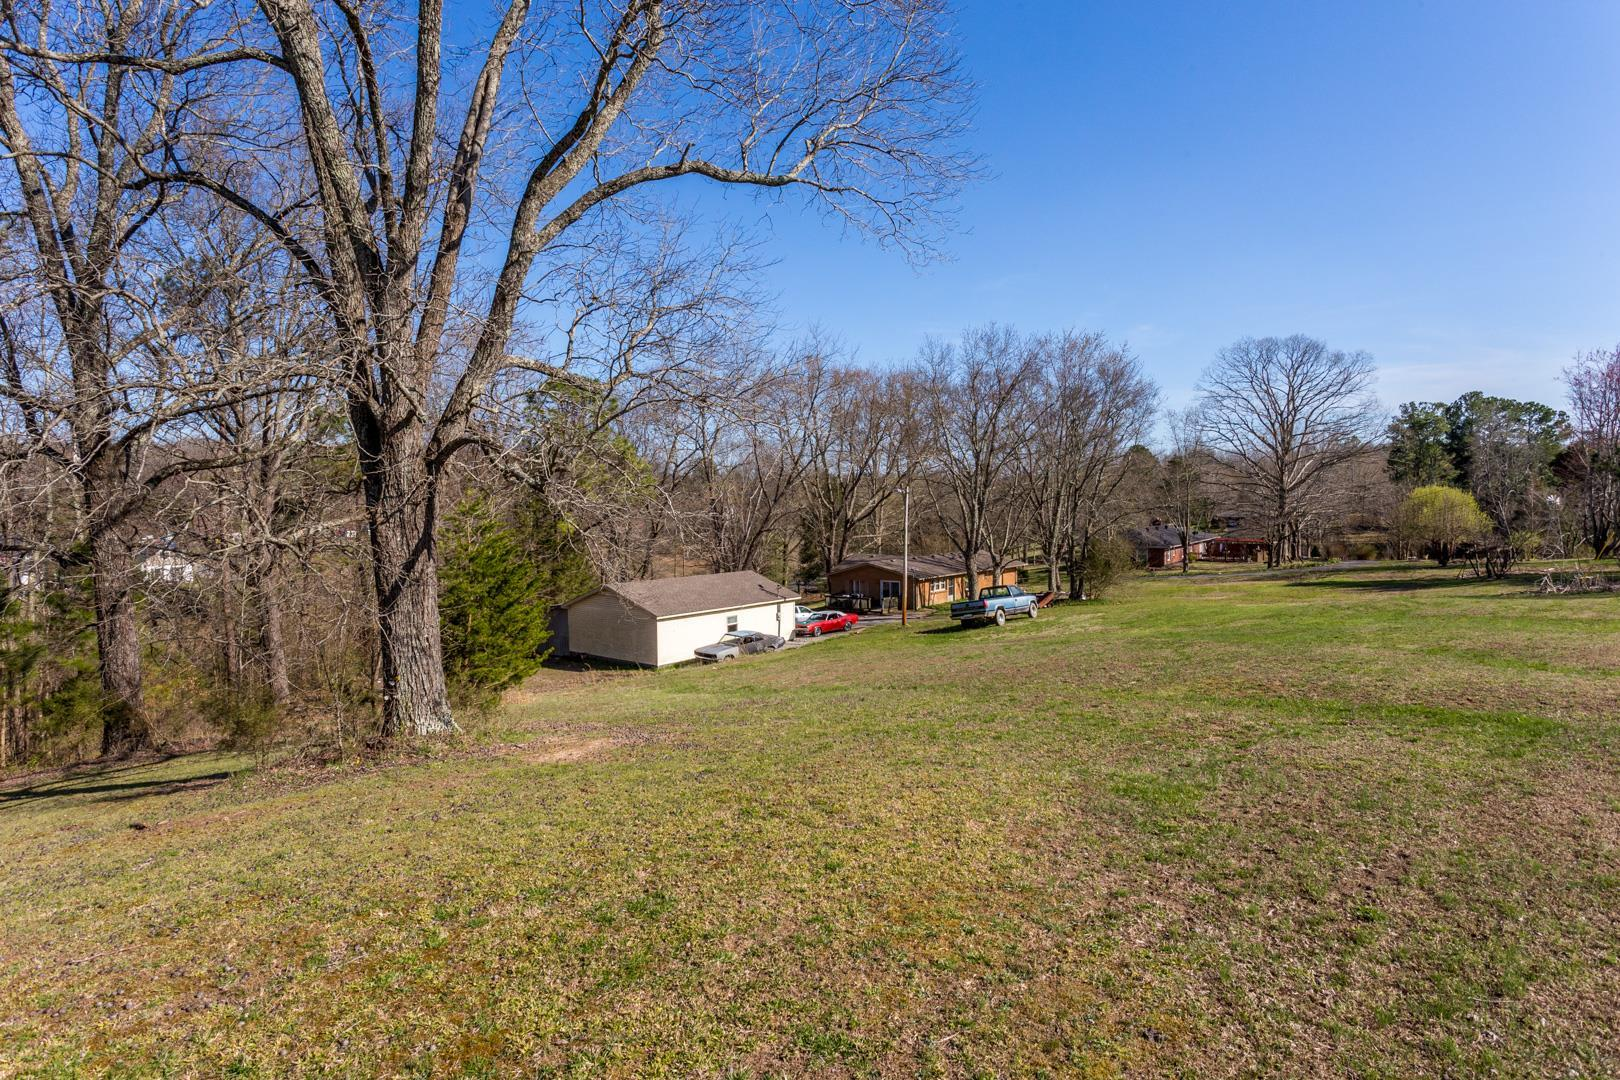 3029 Old Highway 31 E, E, Westmoreland, TN 37186 - Westmoreland, TN real estate listing